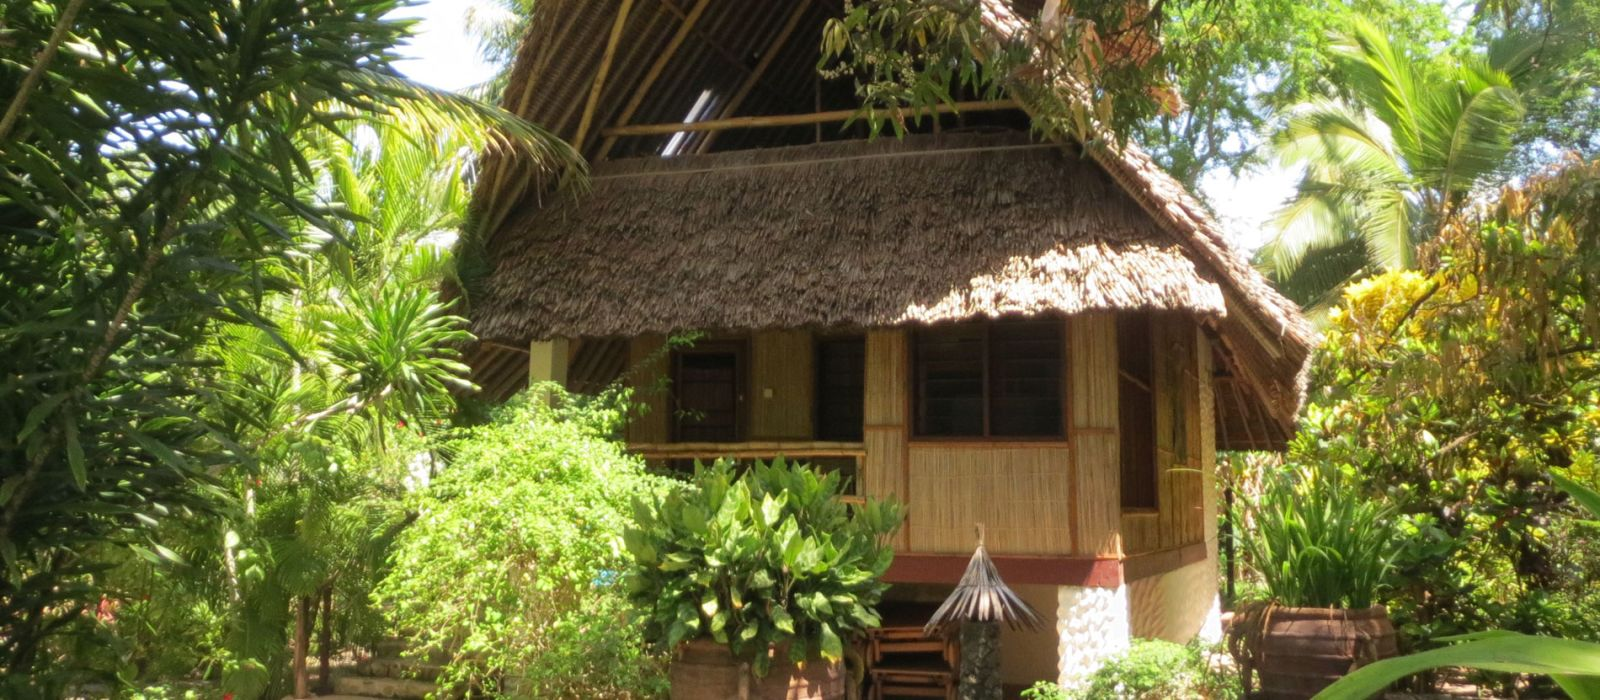 Hotel Mbuyu Bungalows Kenia